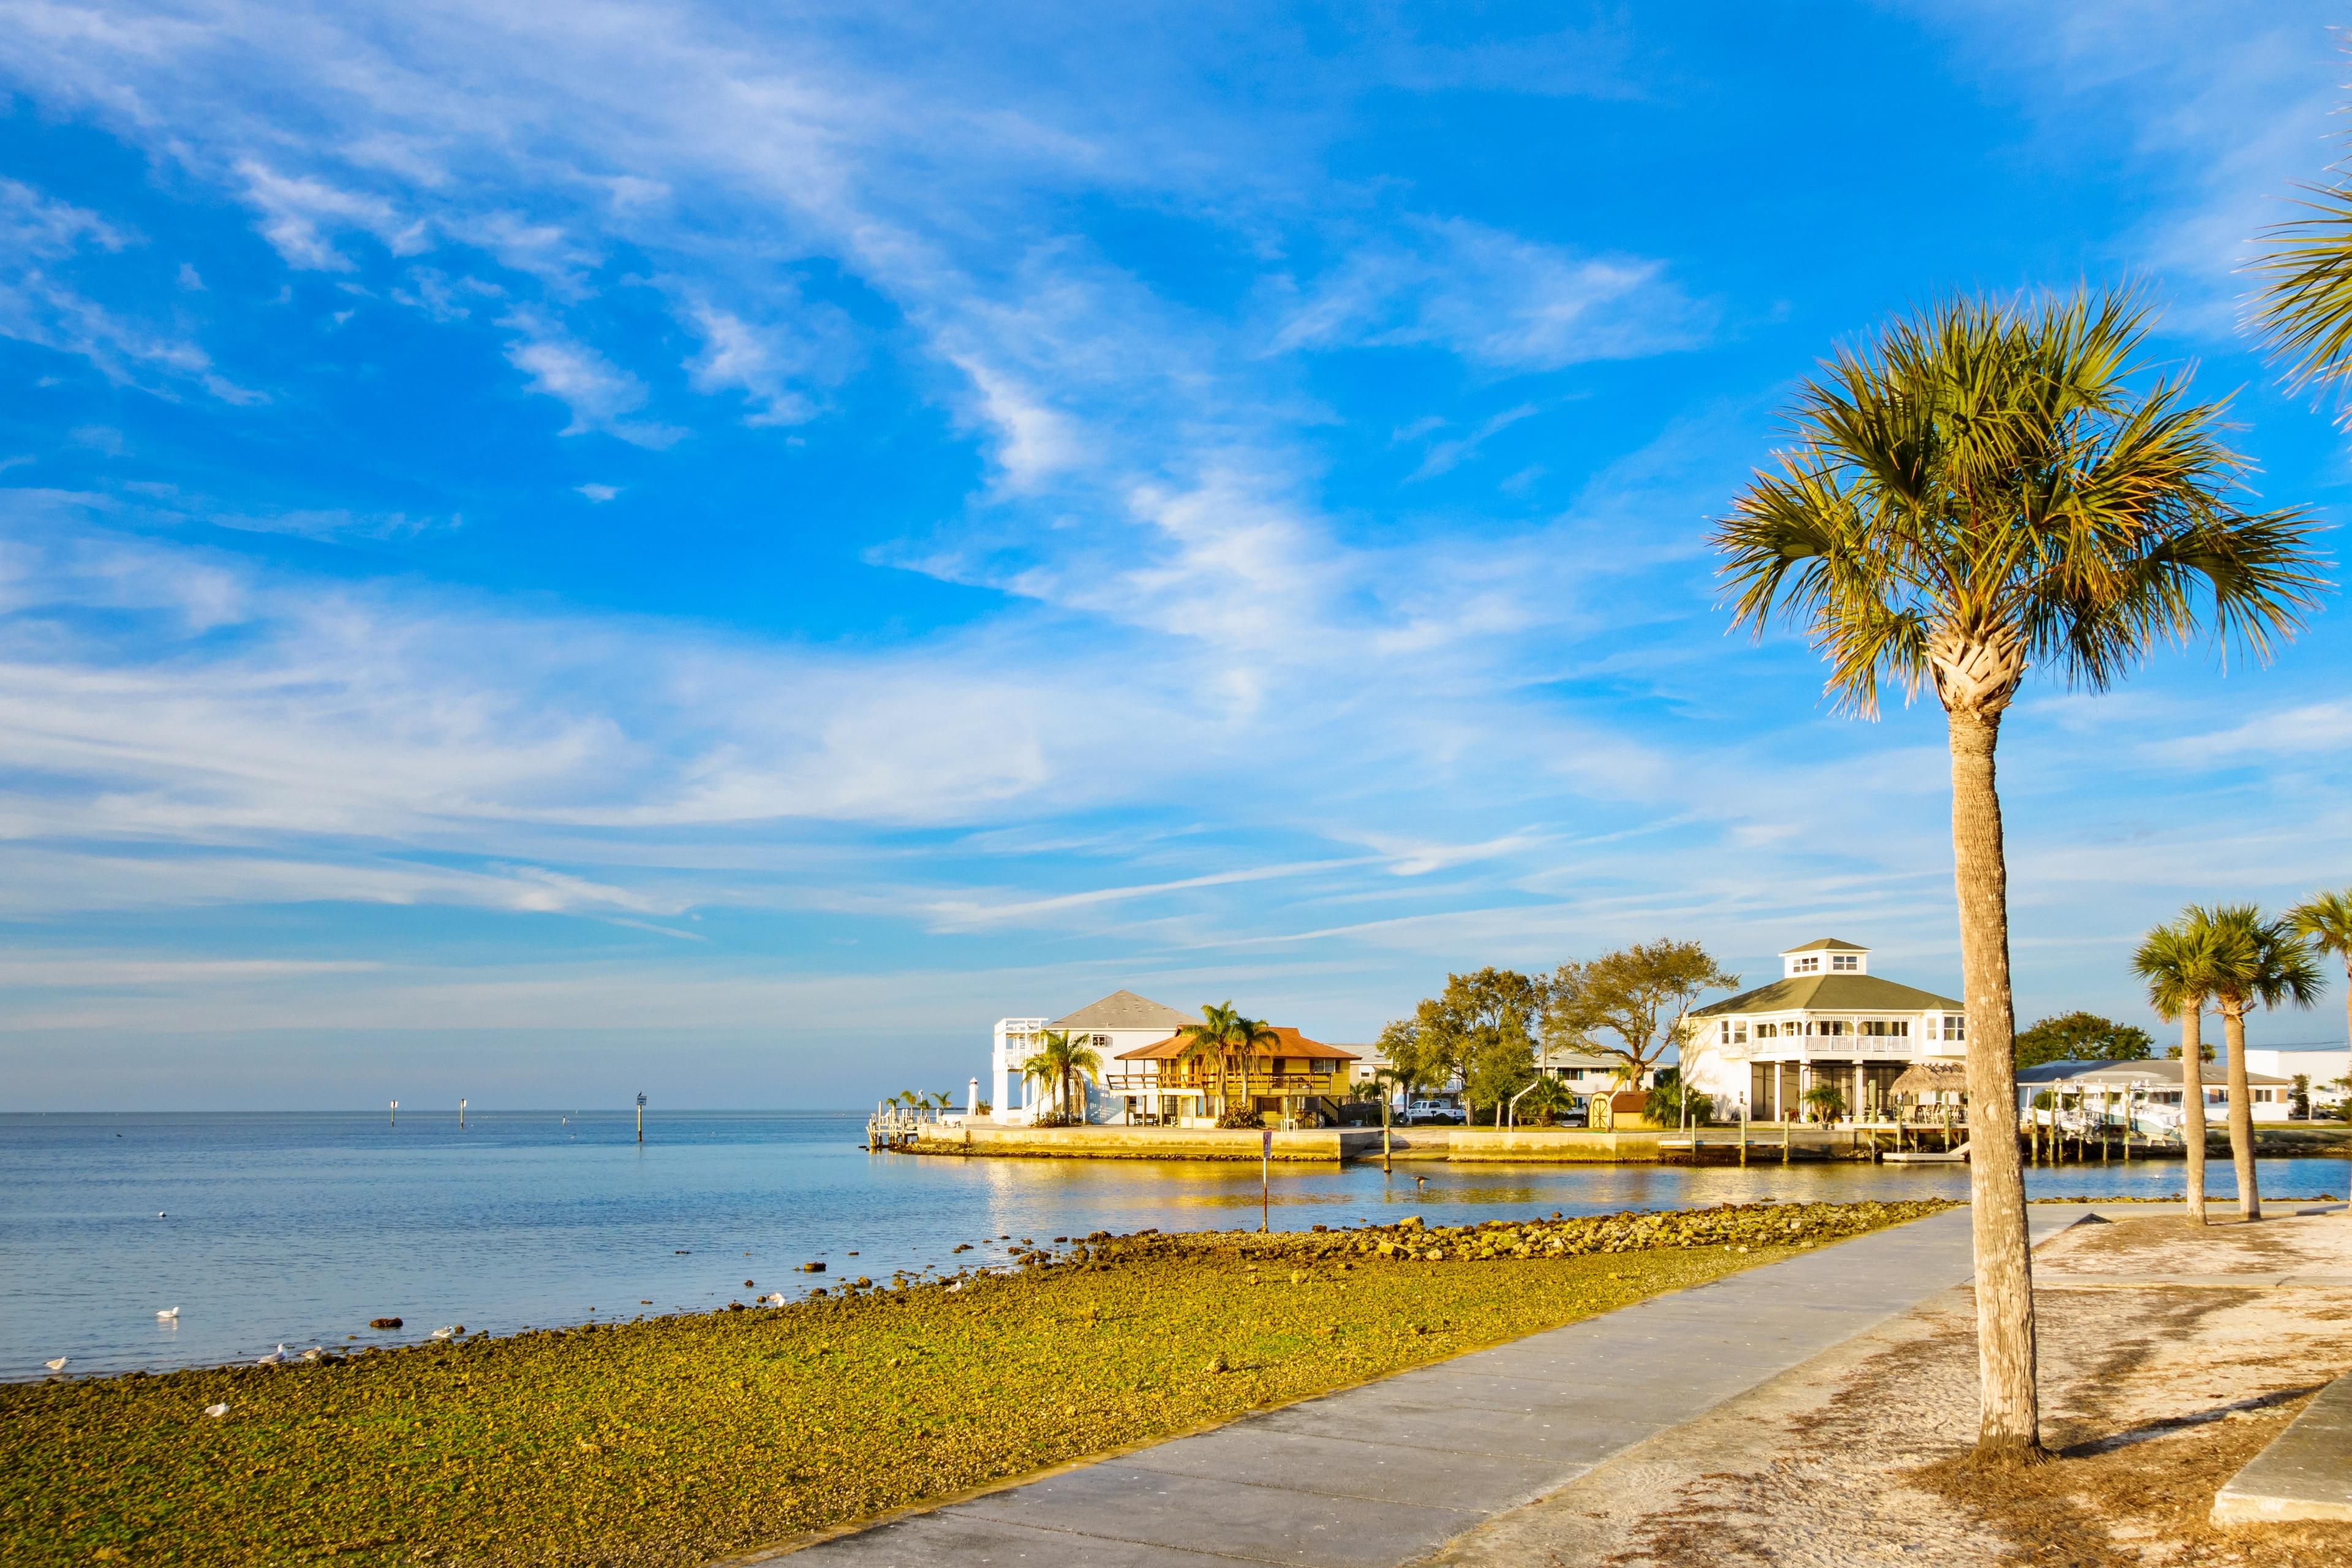 New Port Richey, Florida, United States of America